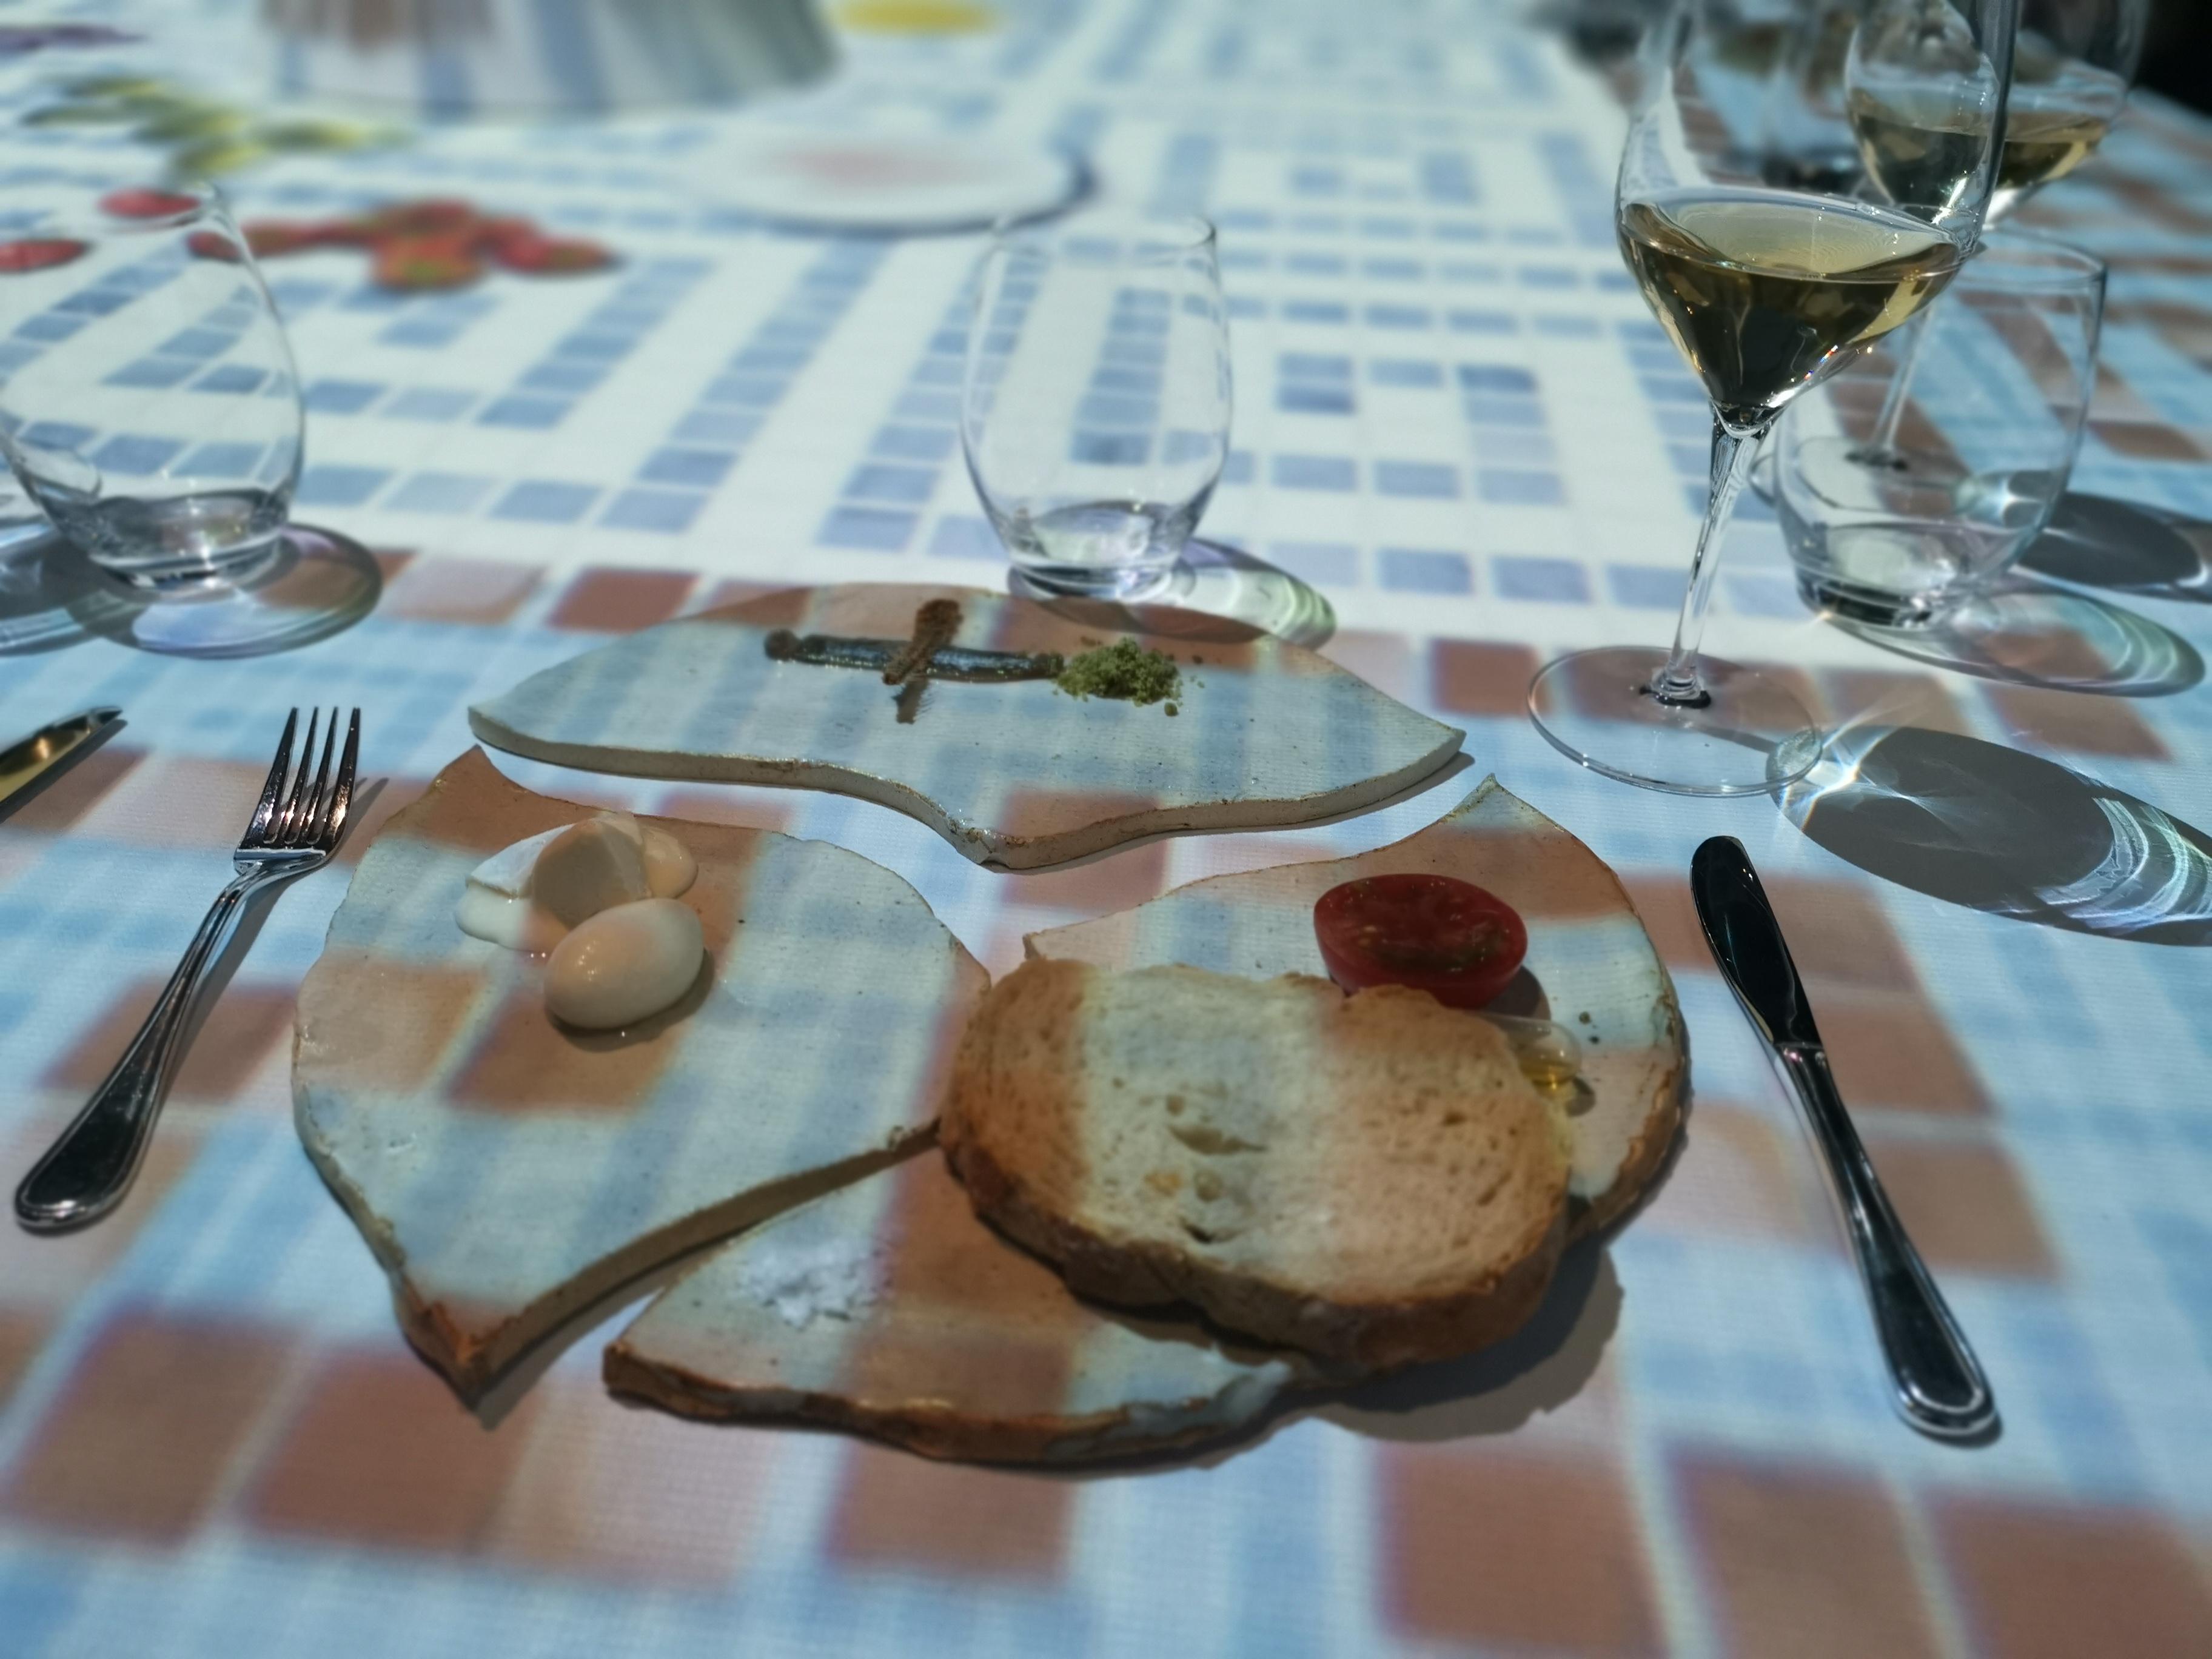 Tastemotion - Costa Brava & Girona pop-up